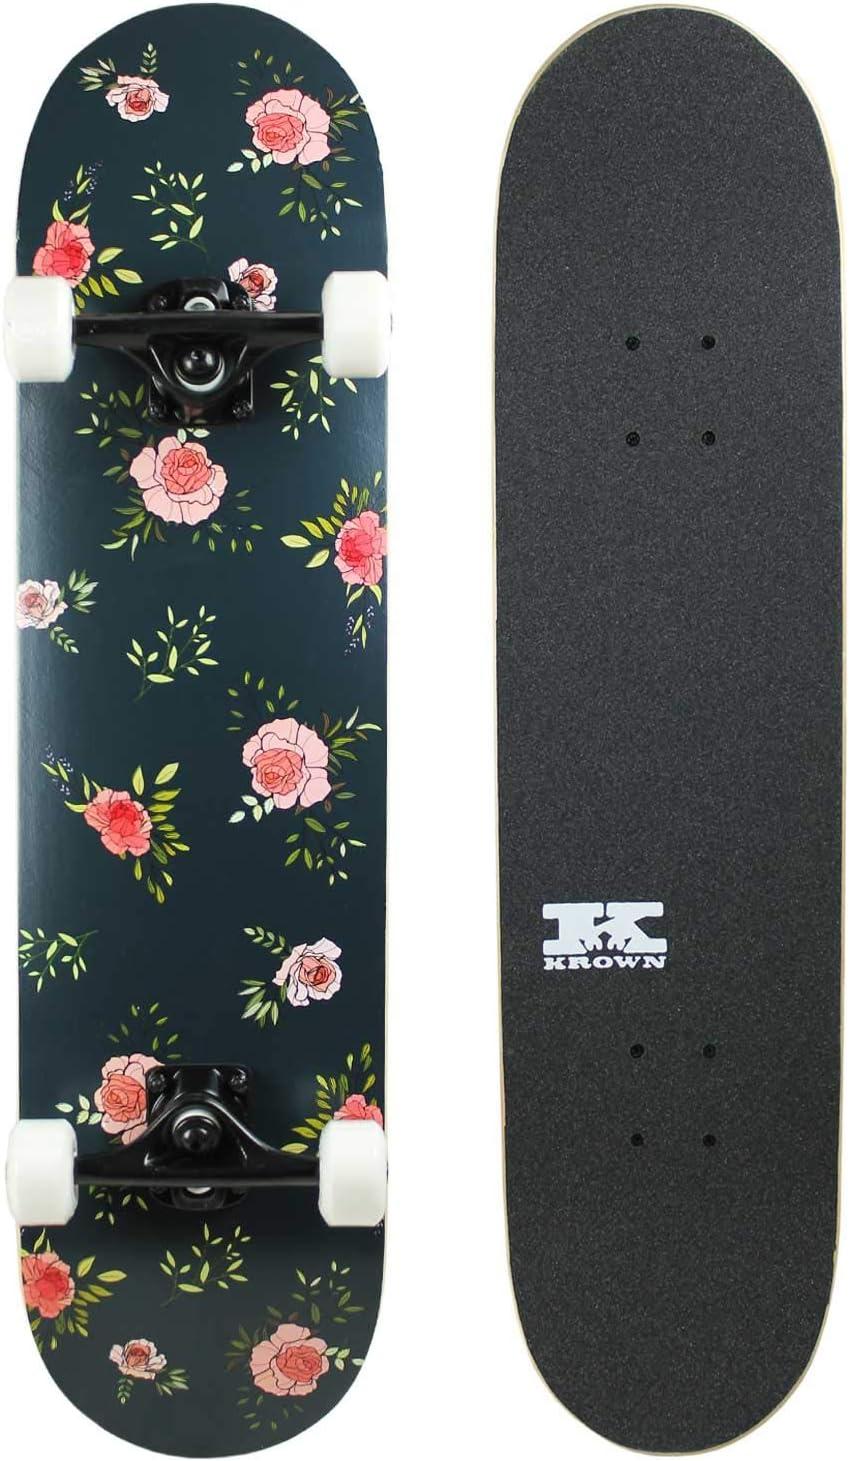 KPC Complete Skateboard Under blast sales - Pro latest Maple Style Quality Deck 7-Ply